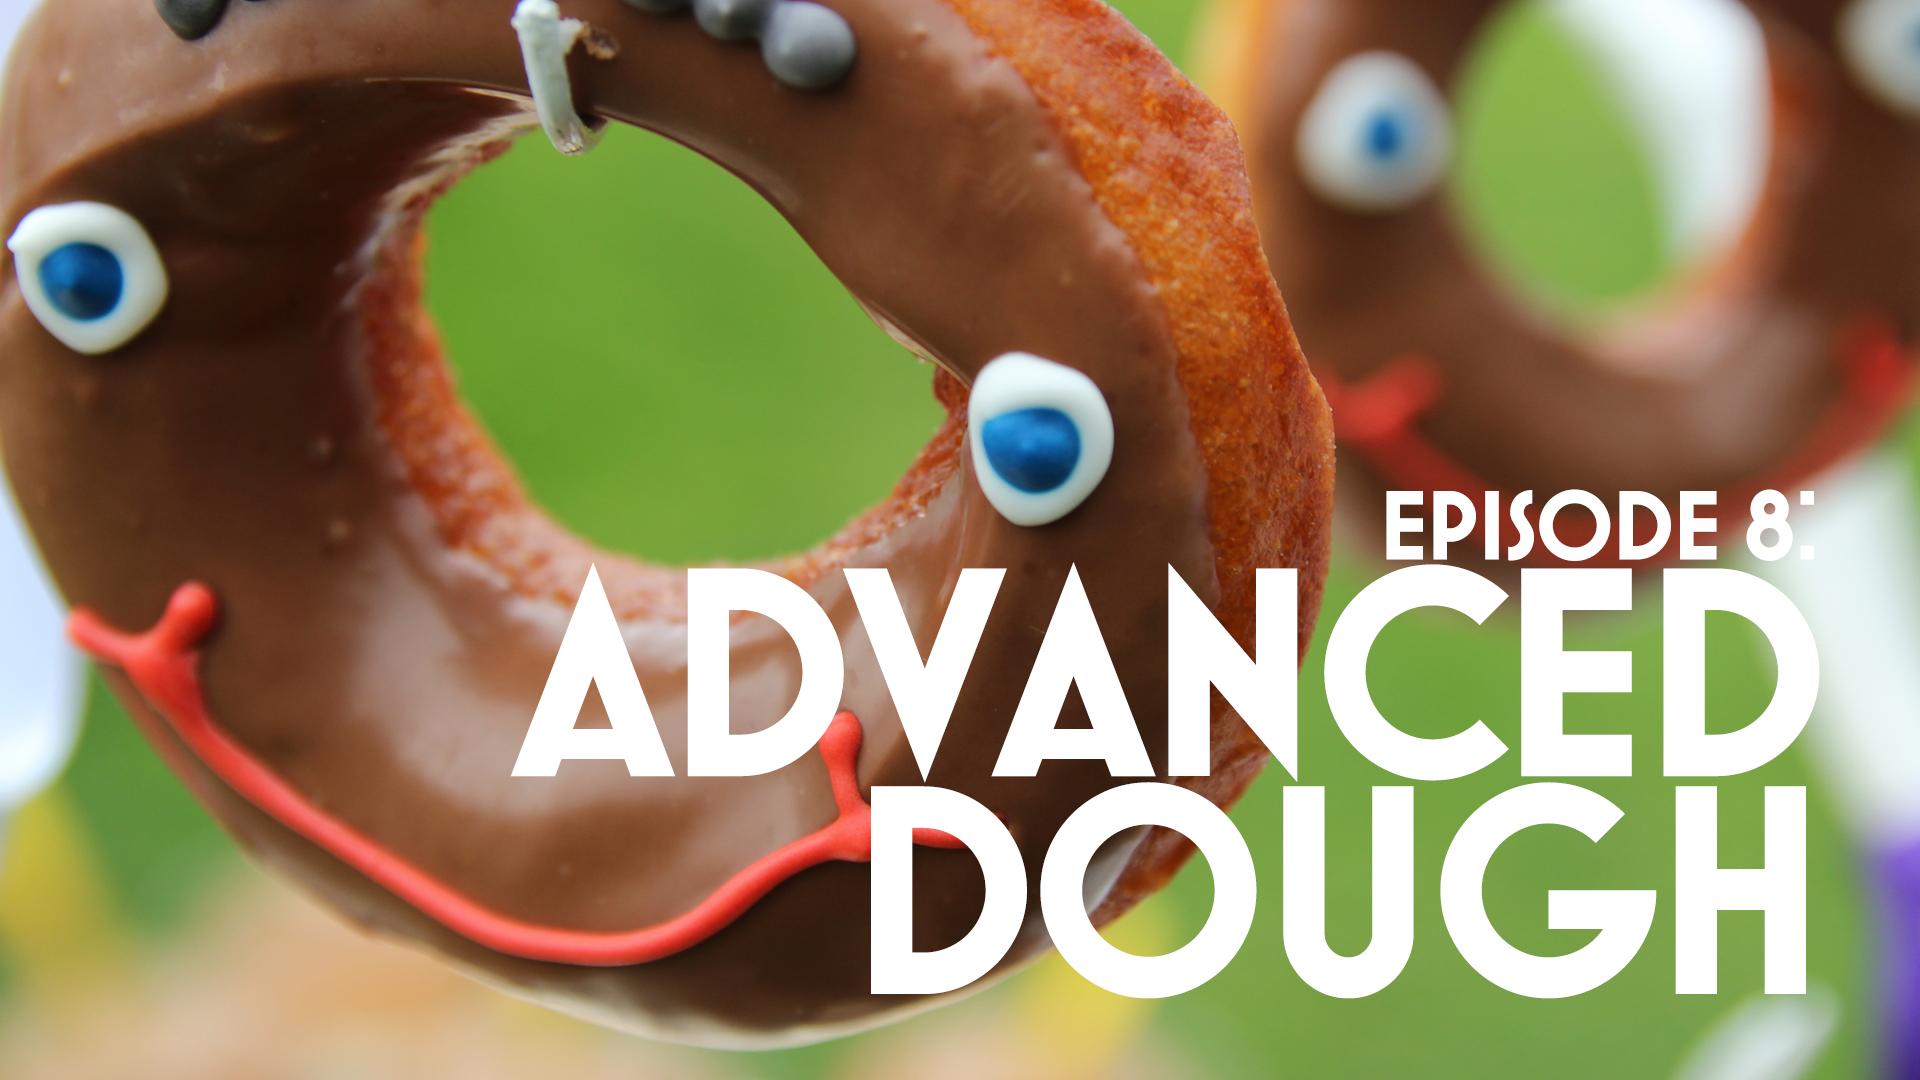 Episode 8: Advanced Dough | The Great British Baking Show